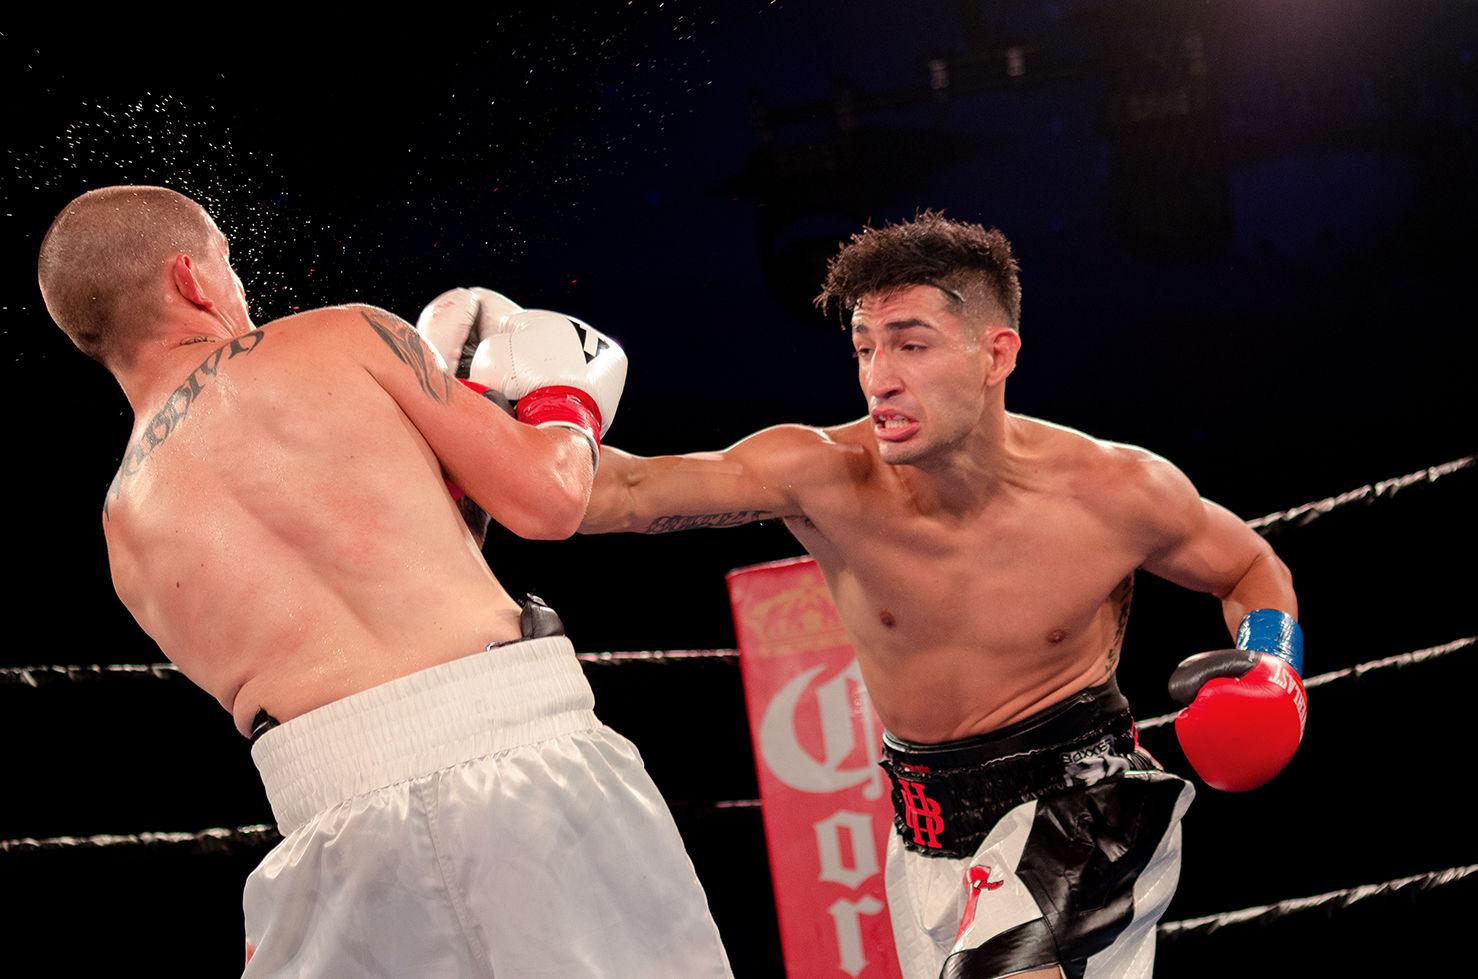 Brandon Holmes punches Gene Perez